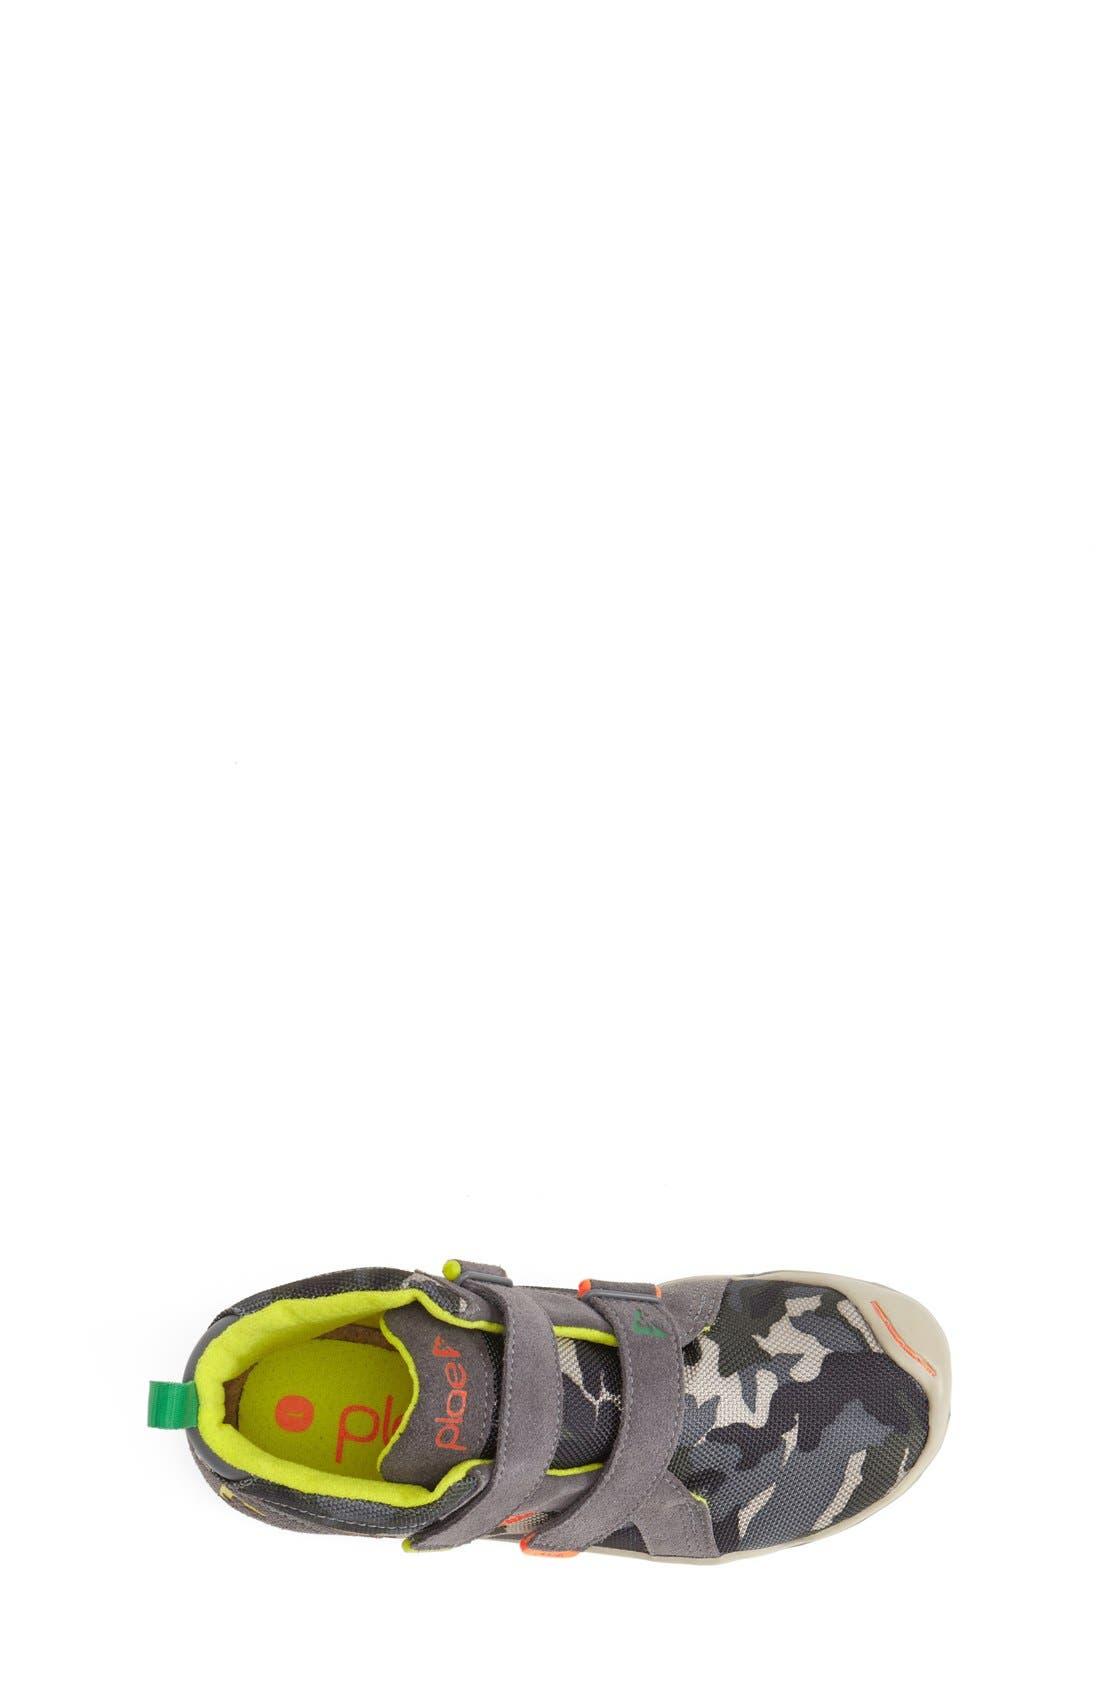 'Max' Customizable High Top Sneaker,                             Alternate thumbnail 3, color,                             054